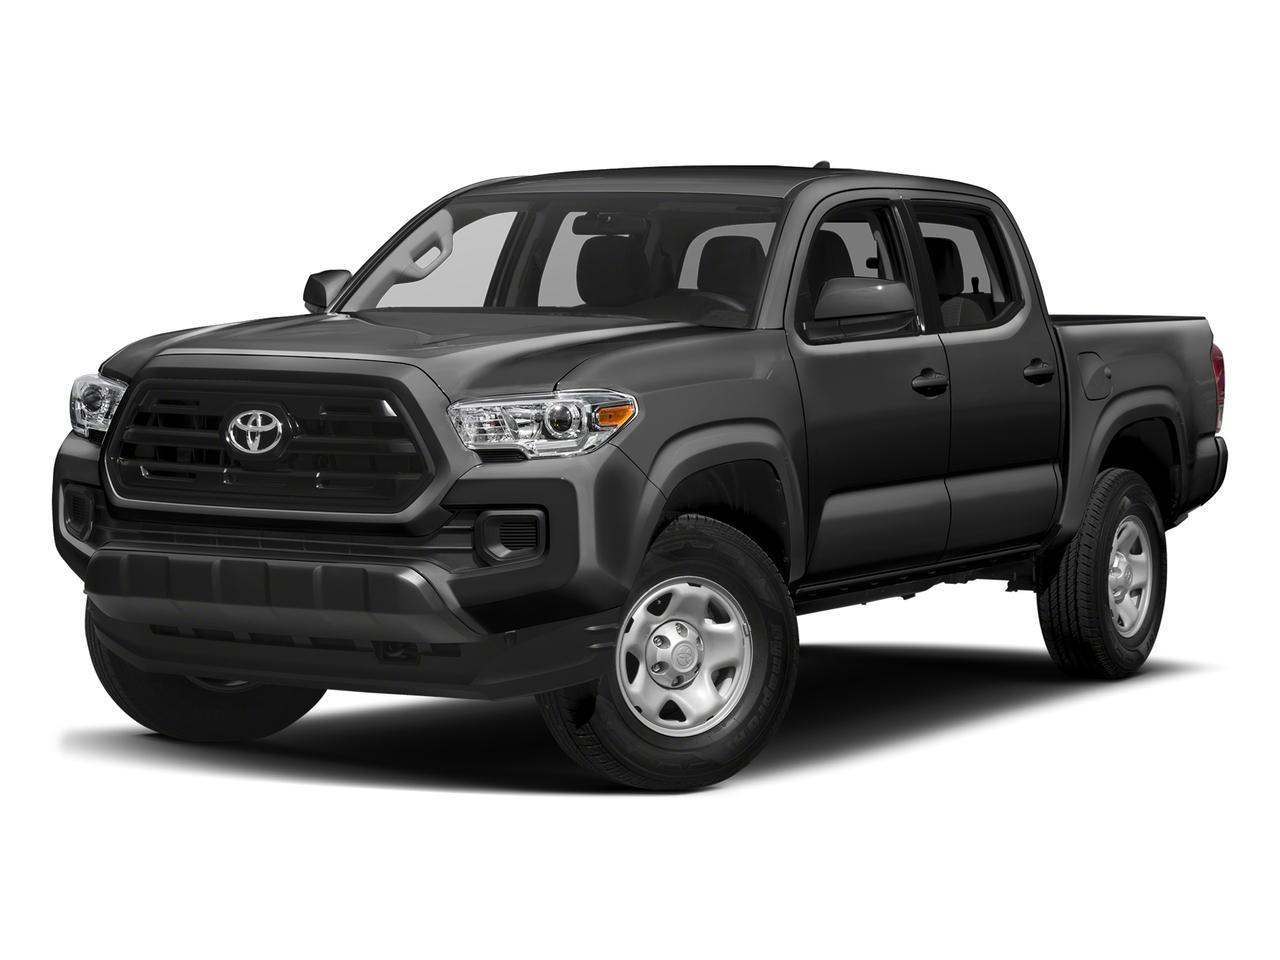 2017 Toyota Tacoma Vehicle Photo in Plainfield, IL 60586